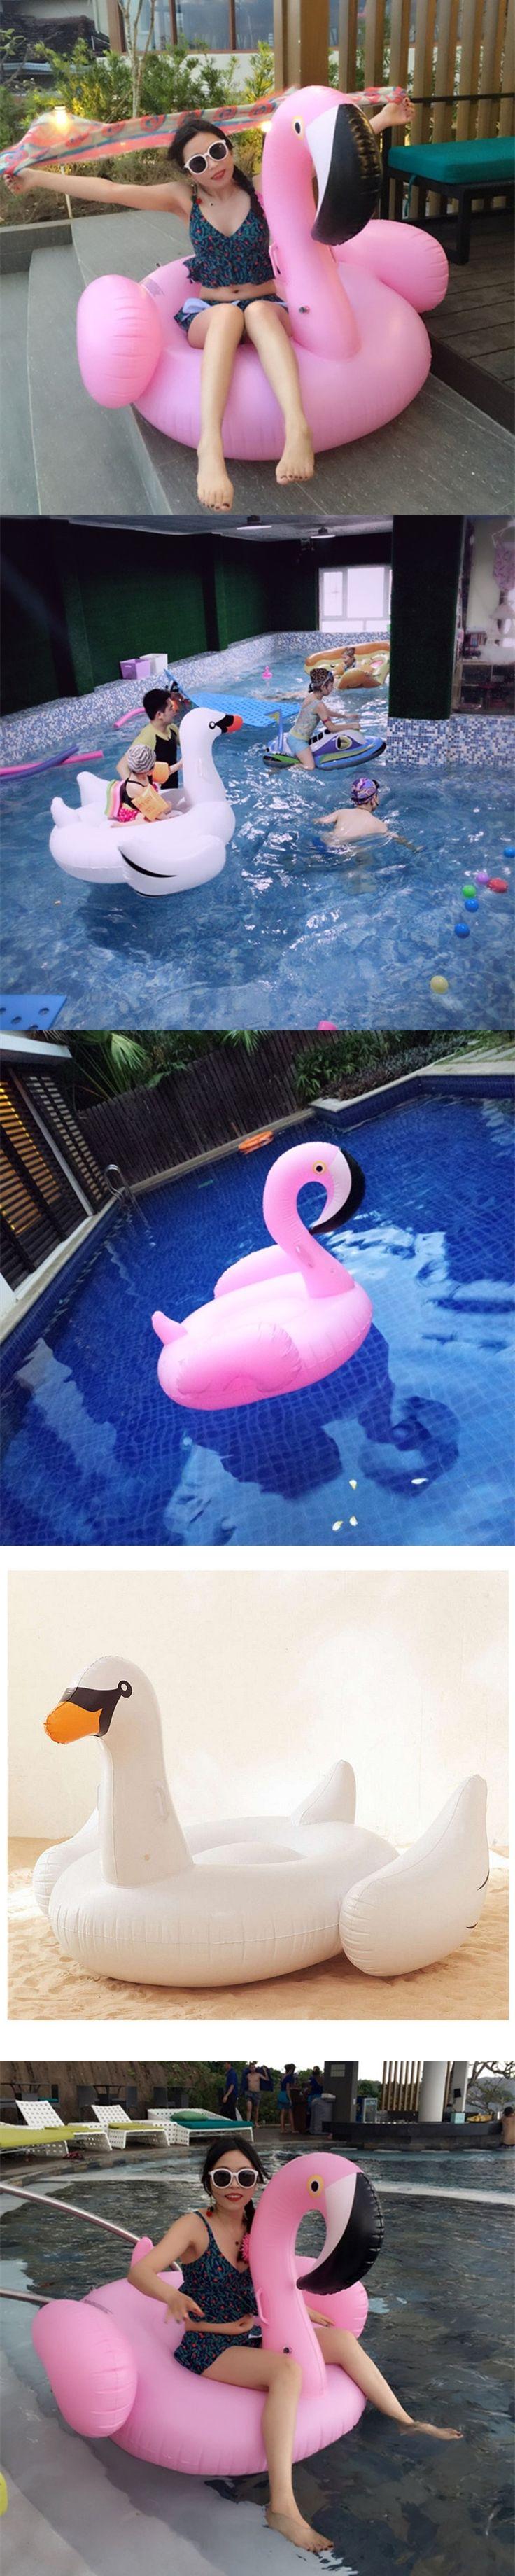 Giant Inflatable Flamingo Pool Float Swimming ring Inflatable Swan Float Flamingo Float Liferafts Pool Float women Pool Toys